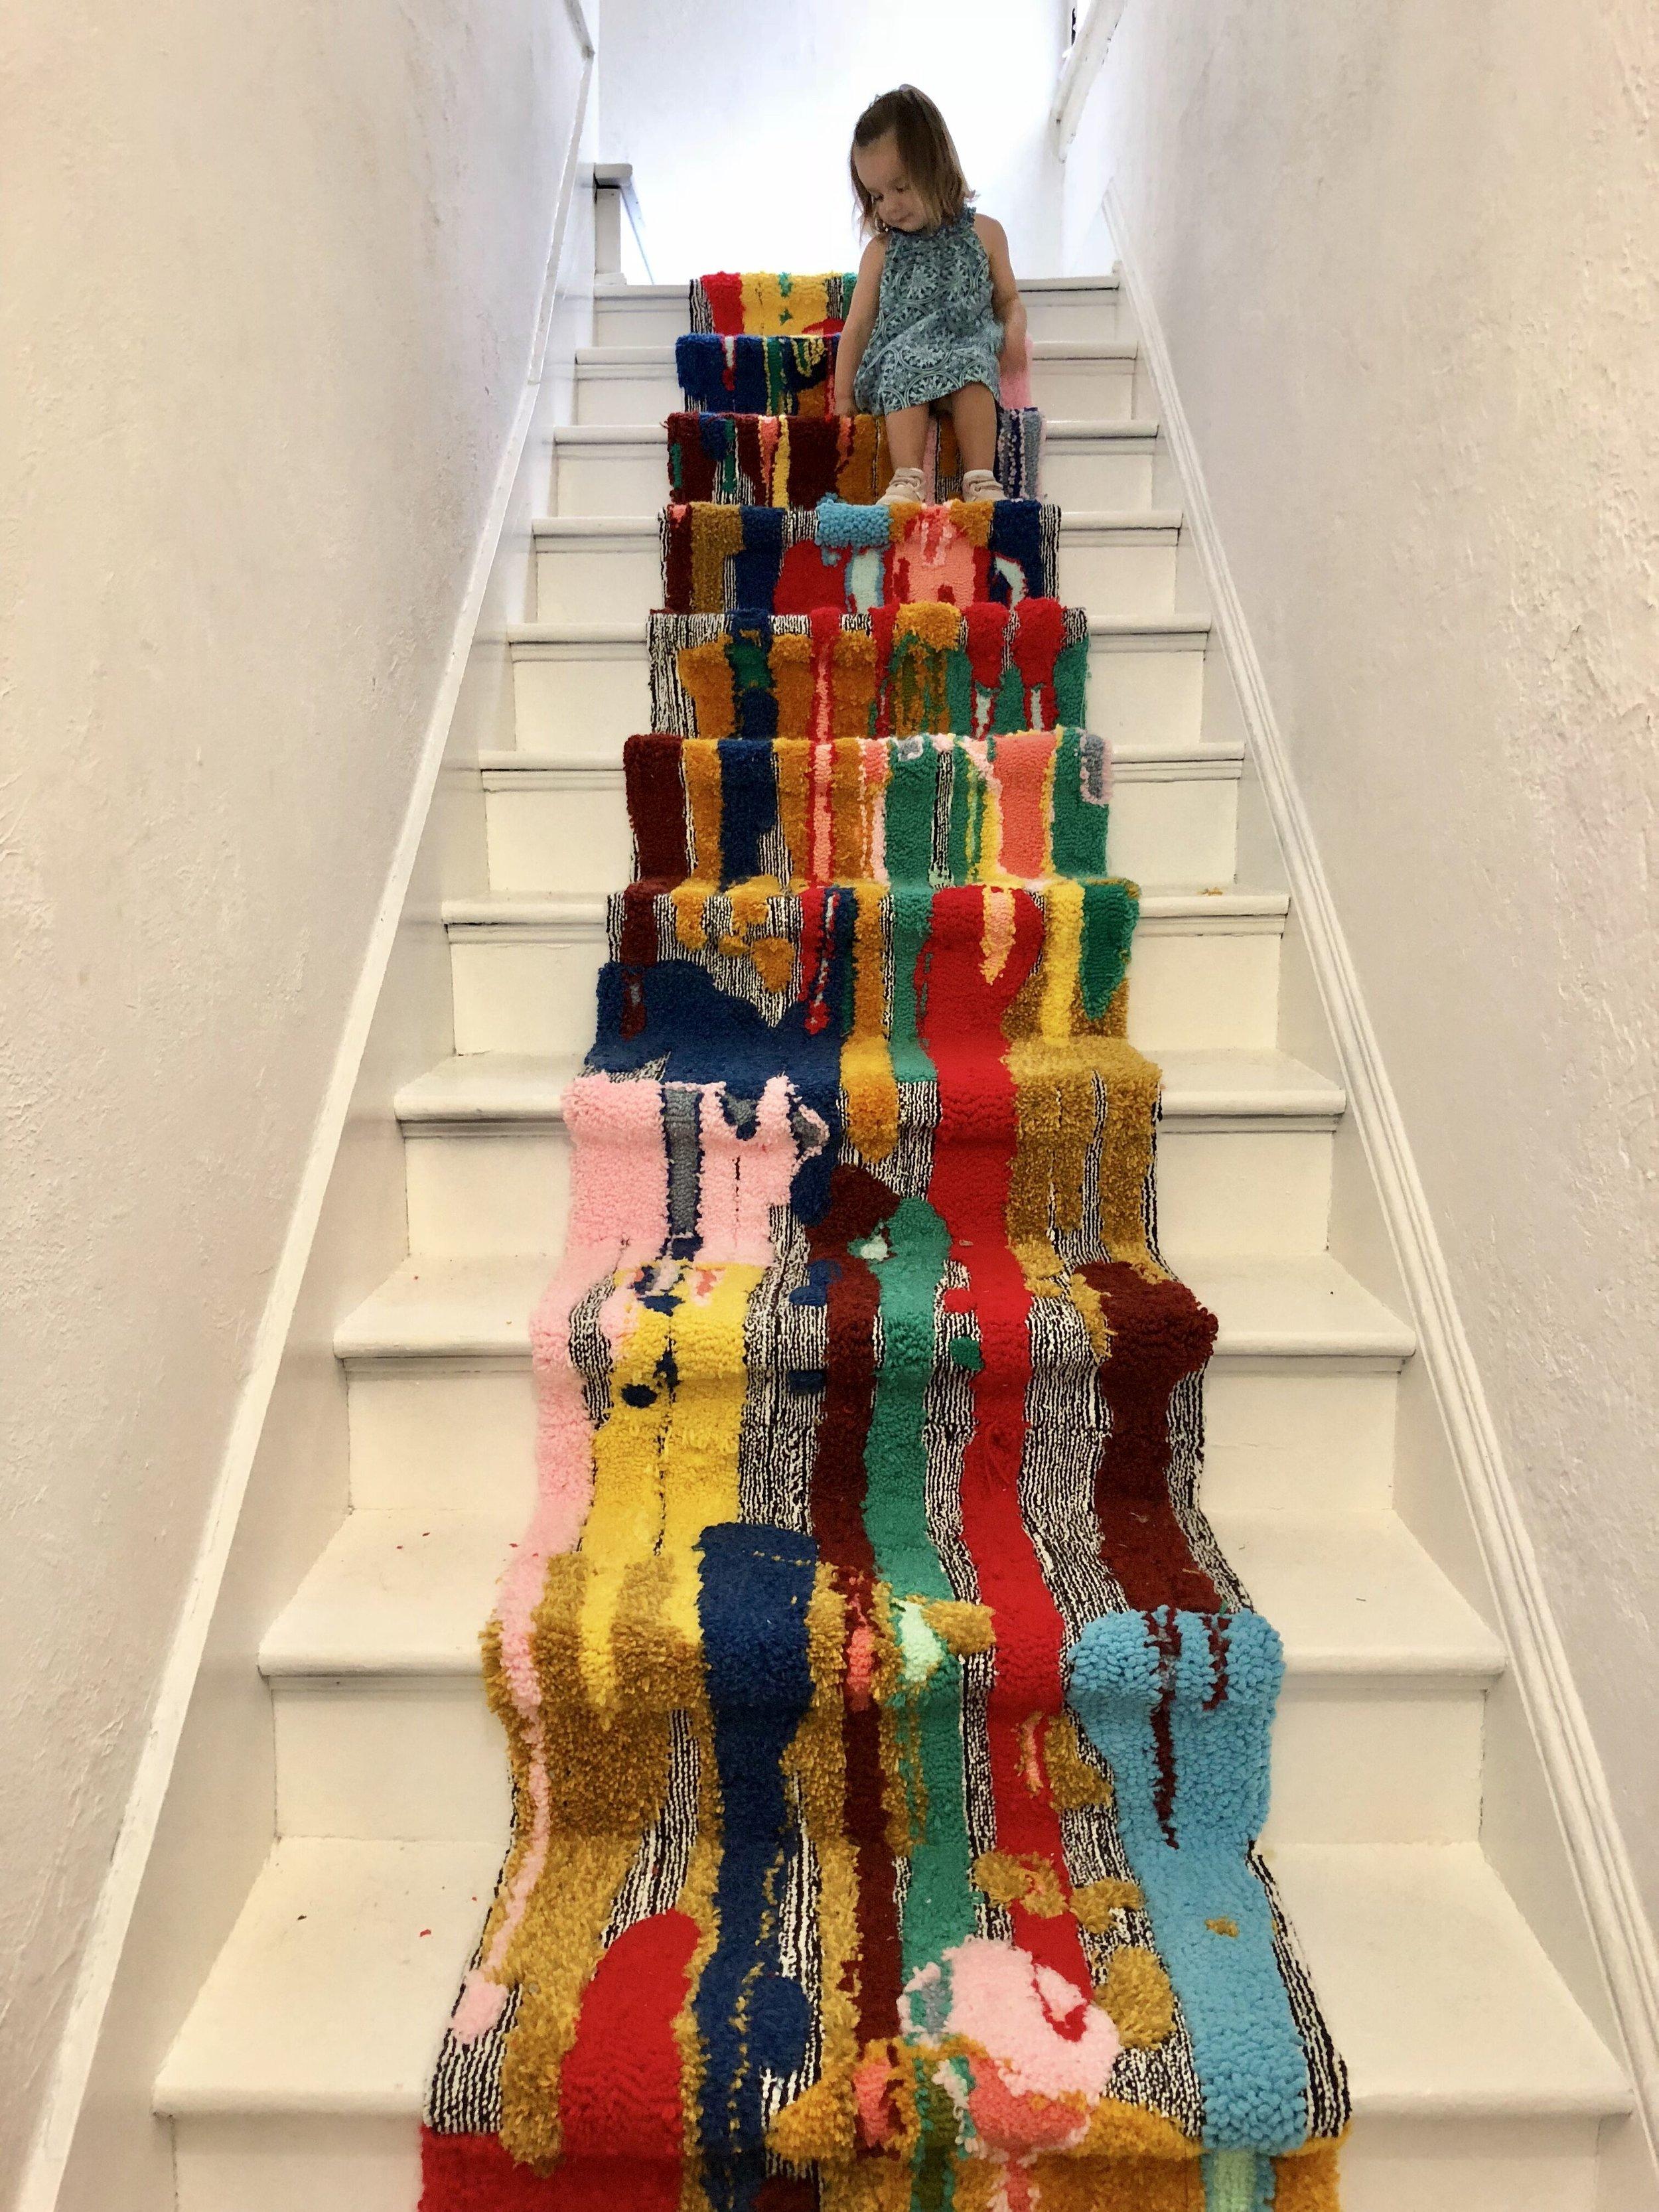 trish_andersen_work_stairs_runner_tuft_5.jpg